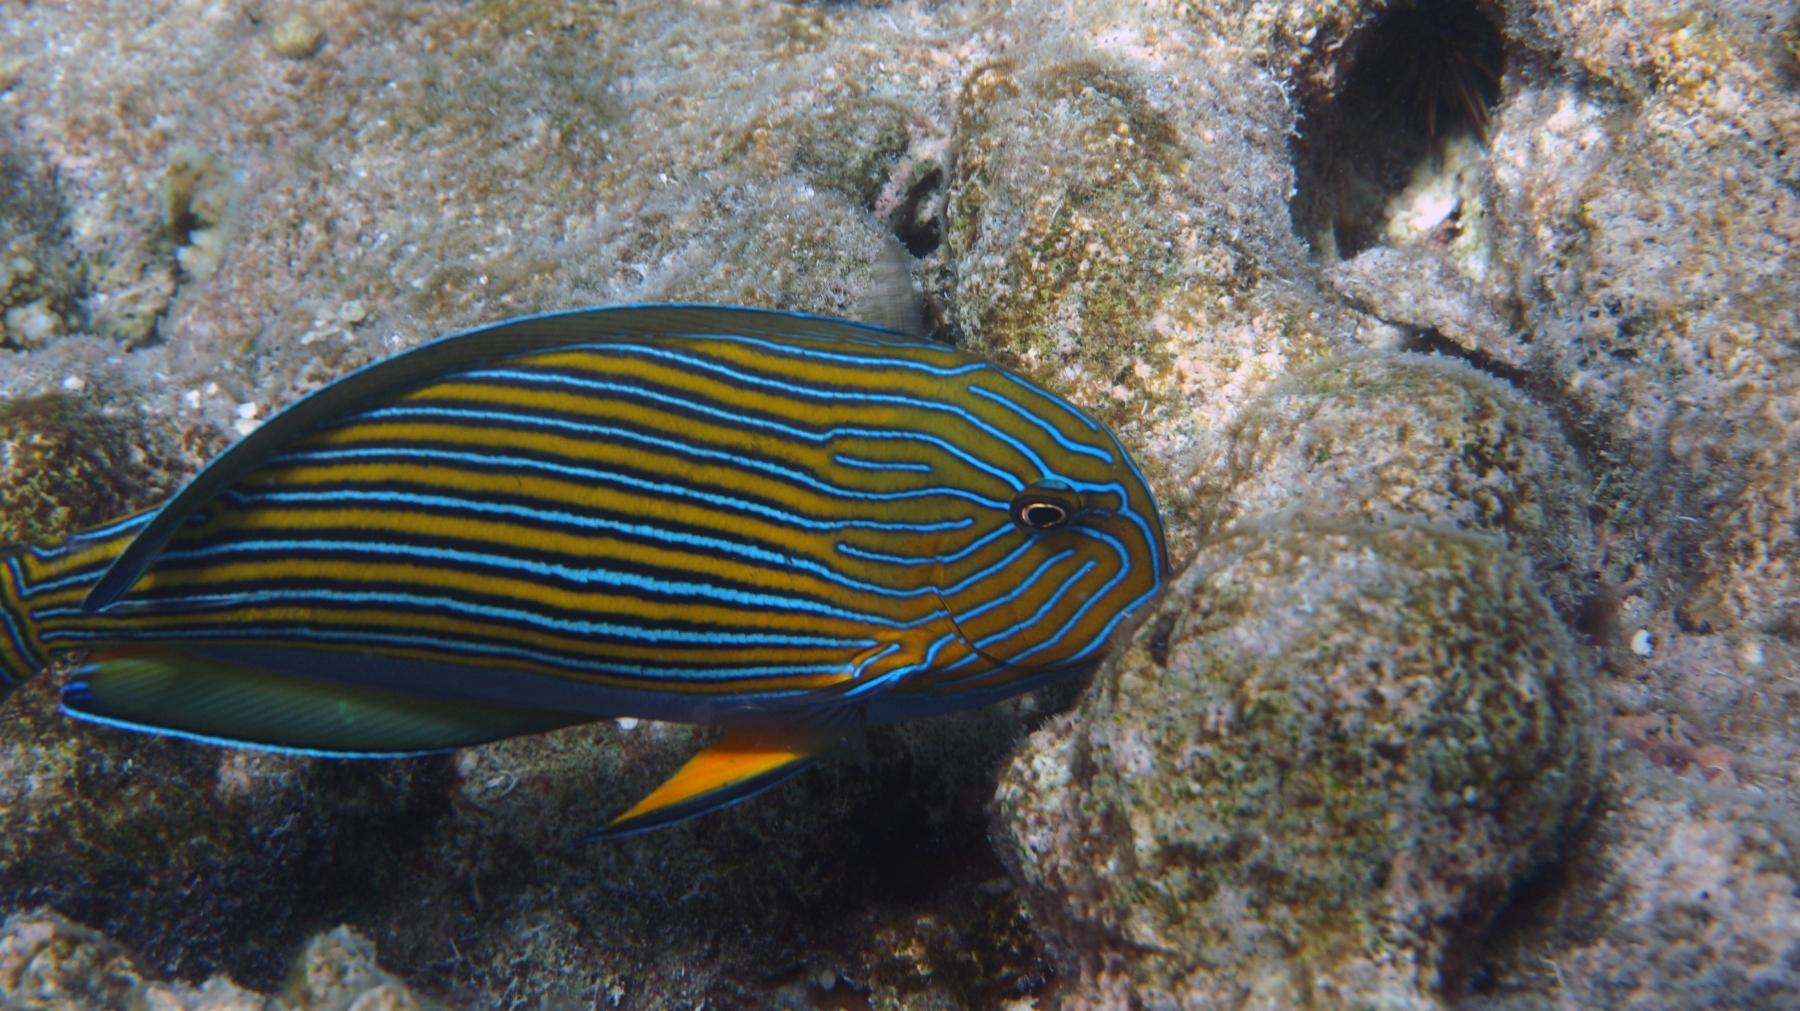 Acanthurus_lineatus_005_C_Peces-Cirujano_L_Maldivas_U_Sebas_04072015